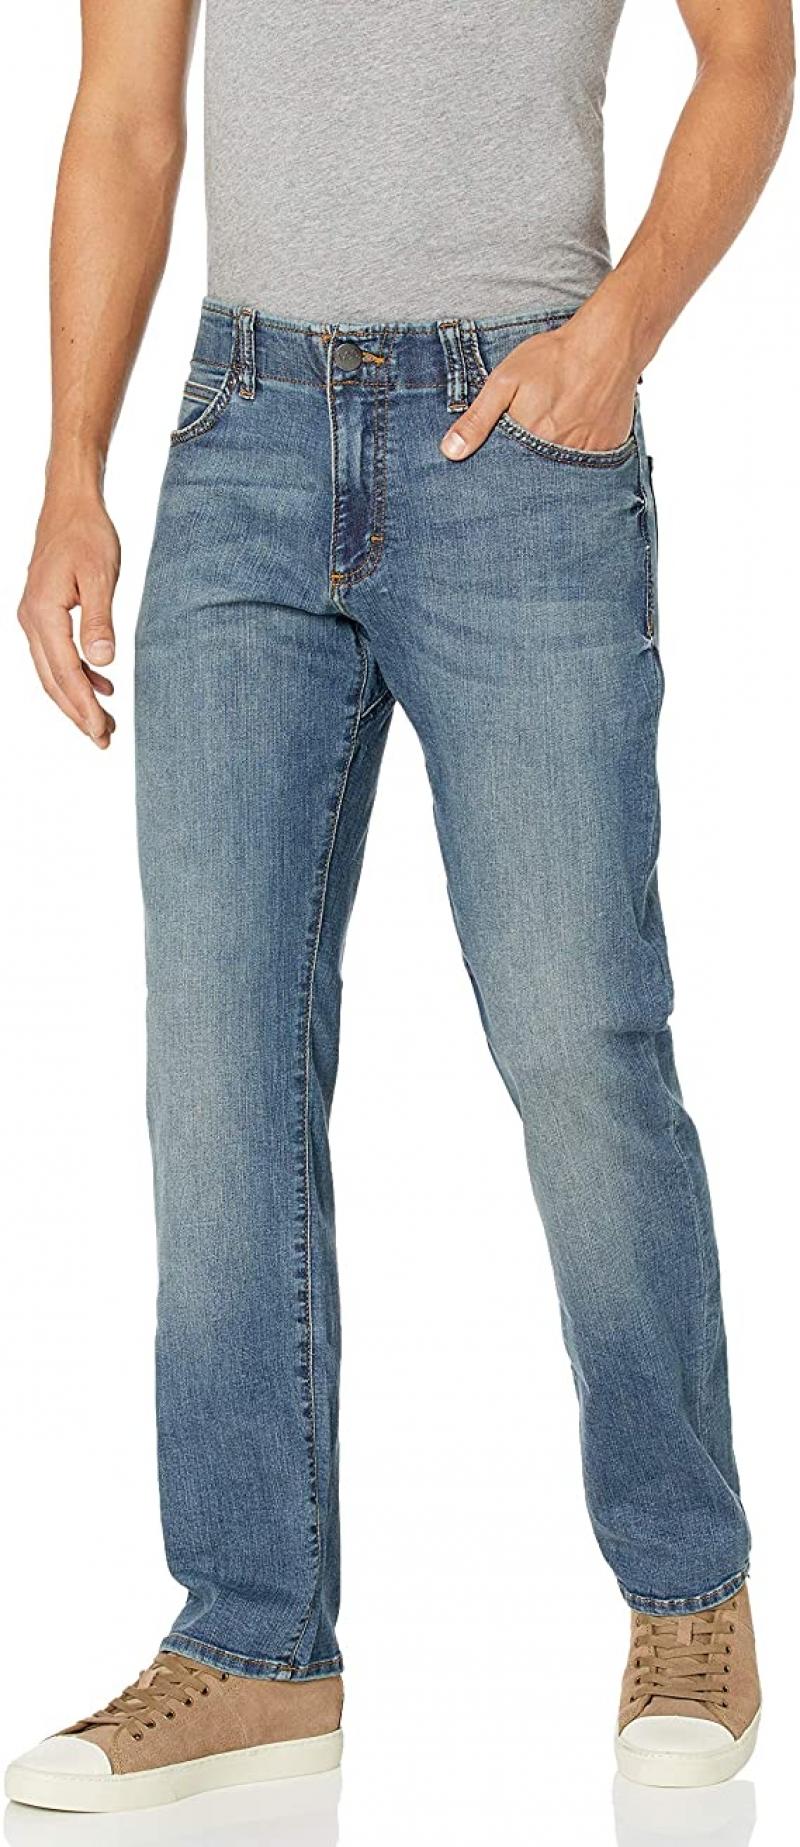 Lee 男士牛仔褲 $15(原價$36.90)